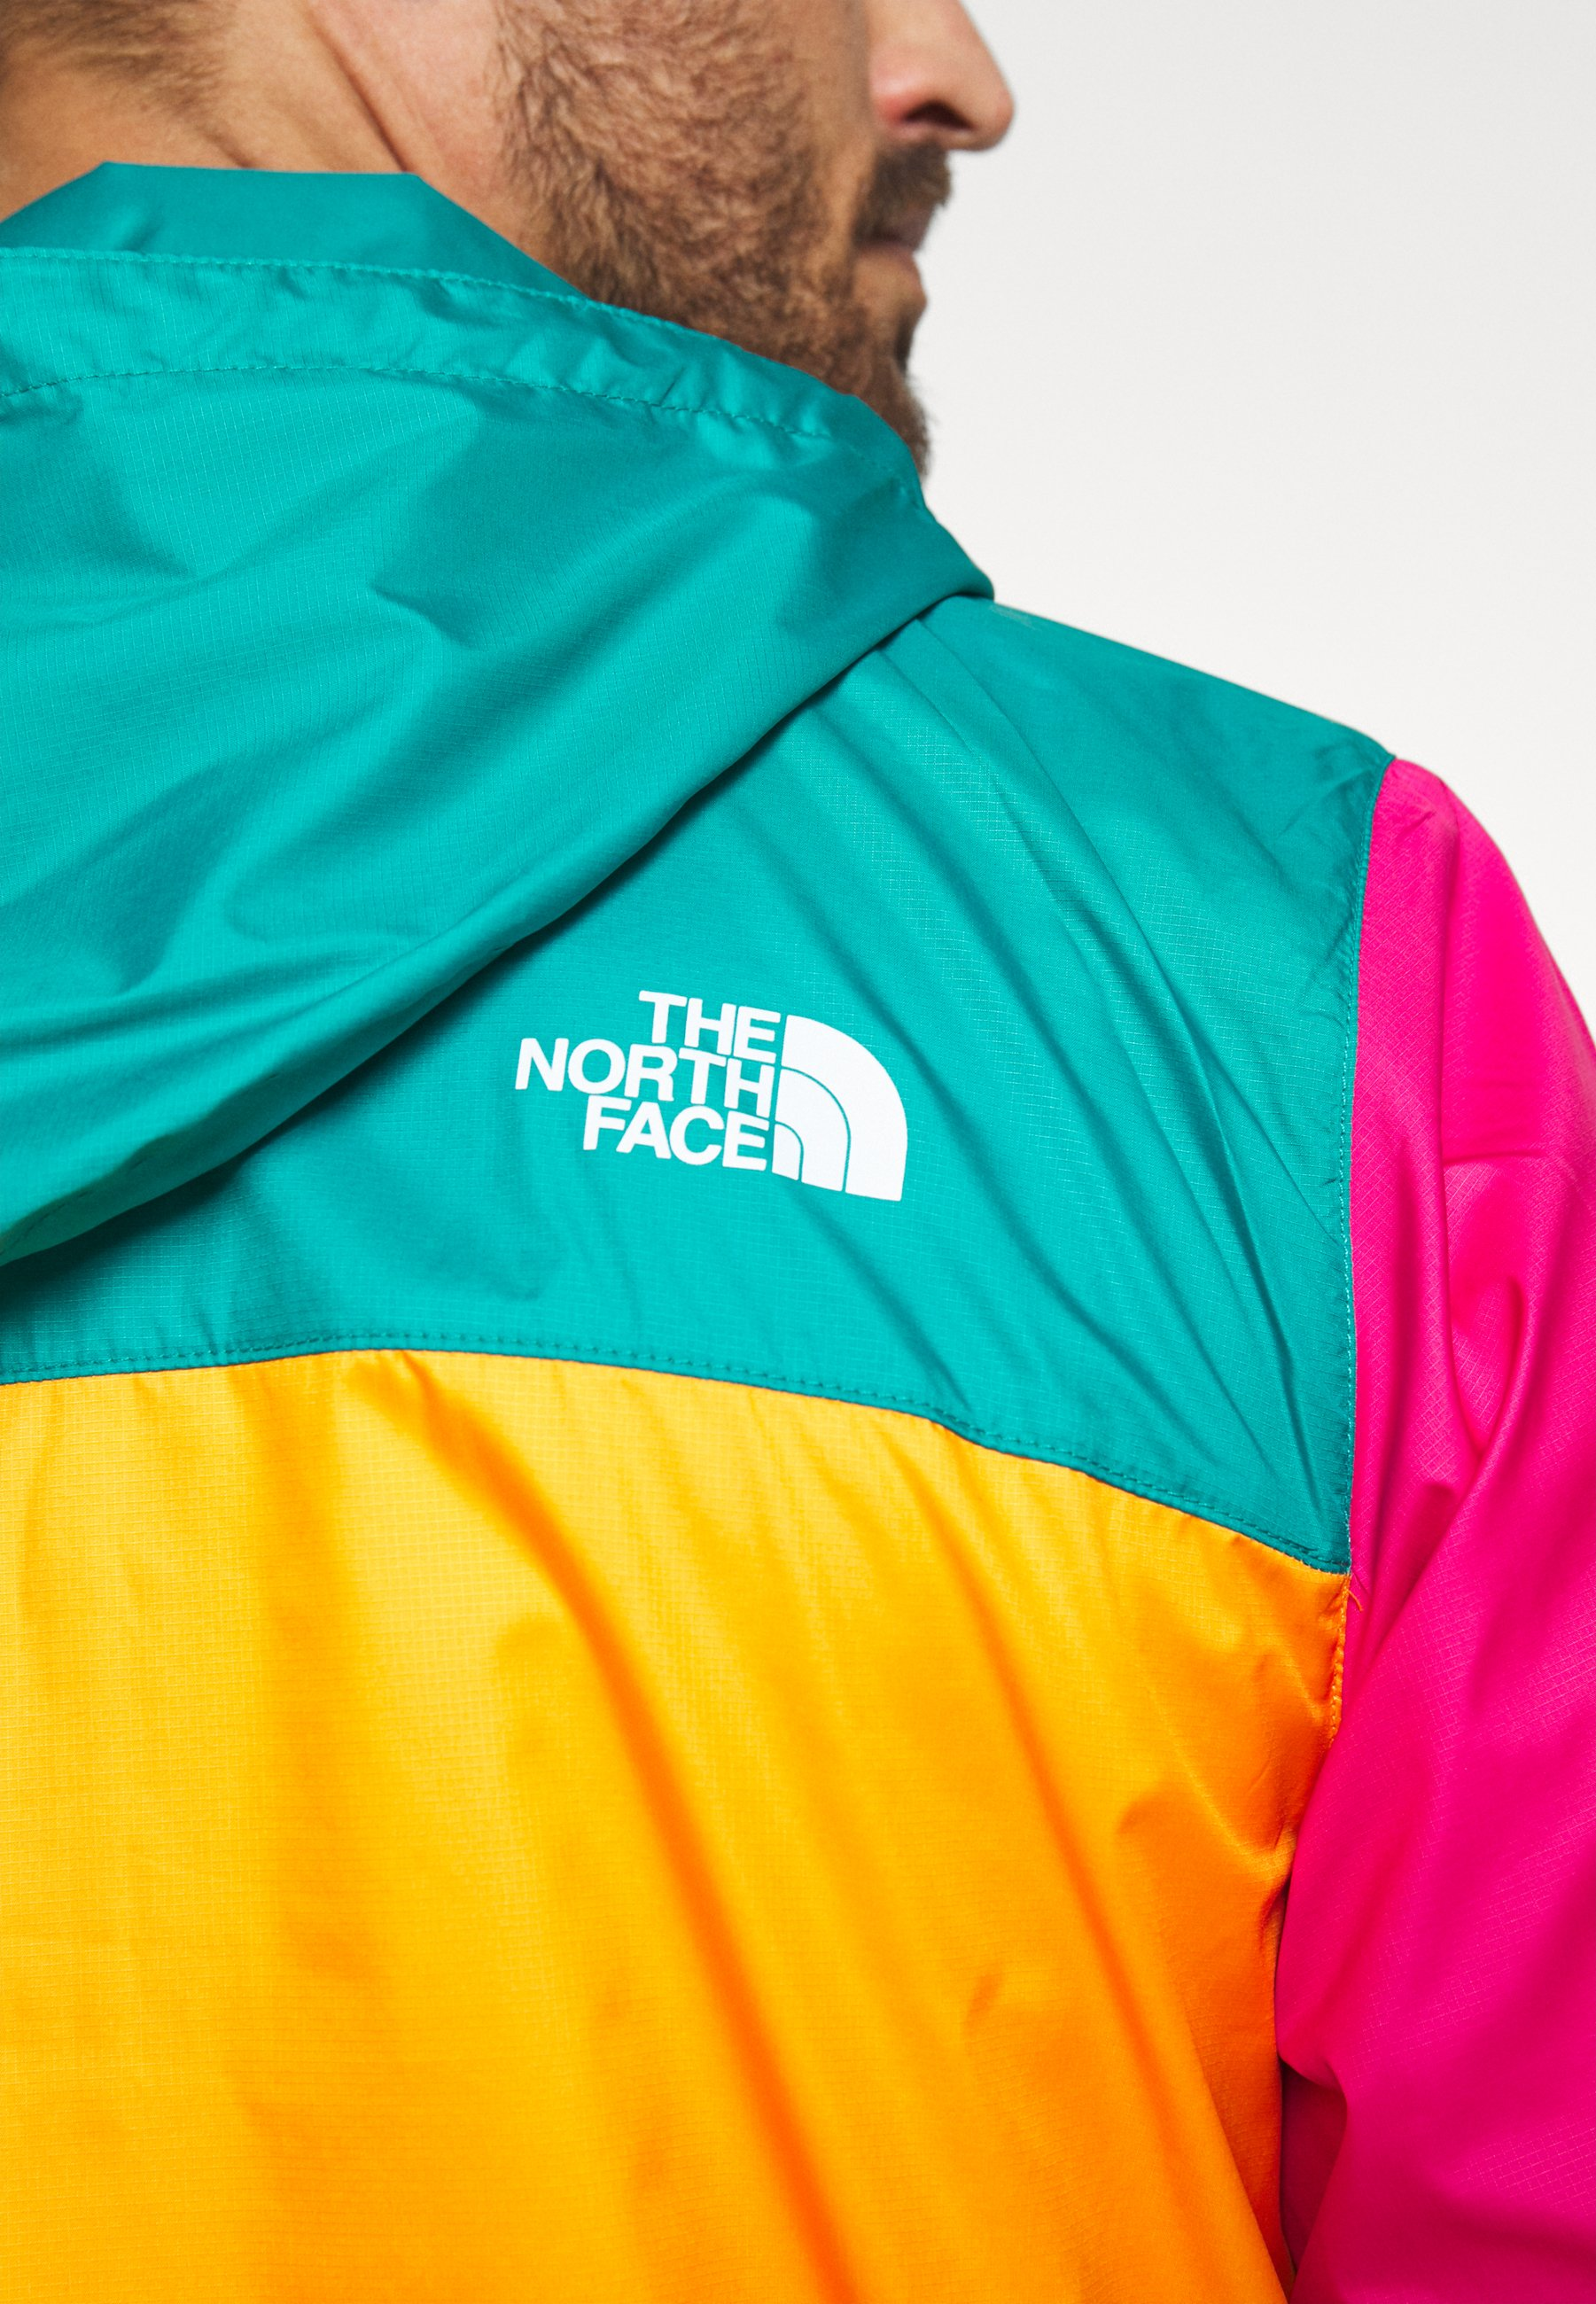 The North Face MENS FANORAK - Veste coupe-vent - orange/teal/pink